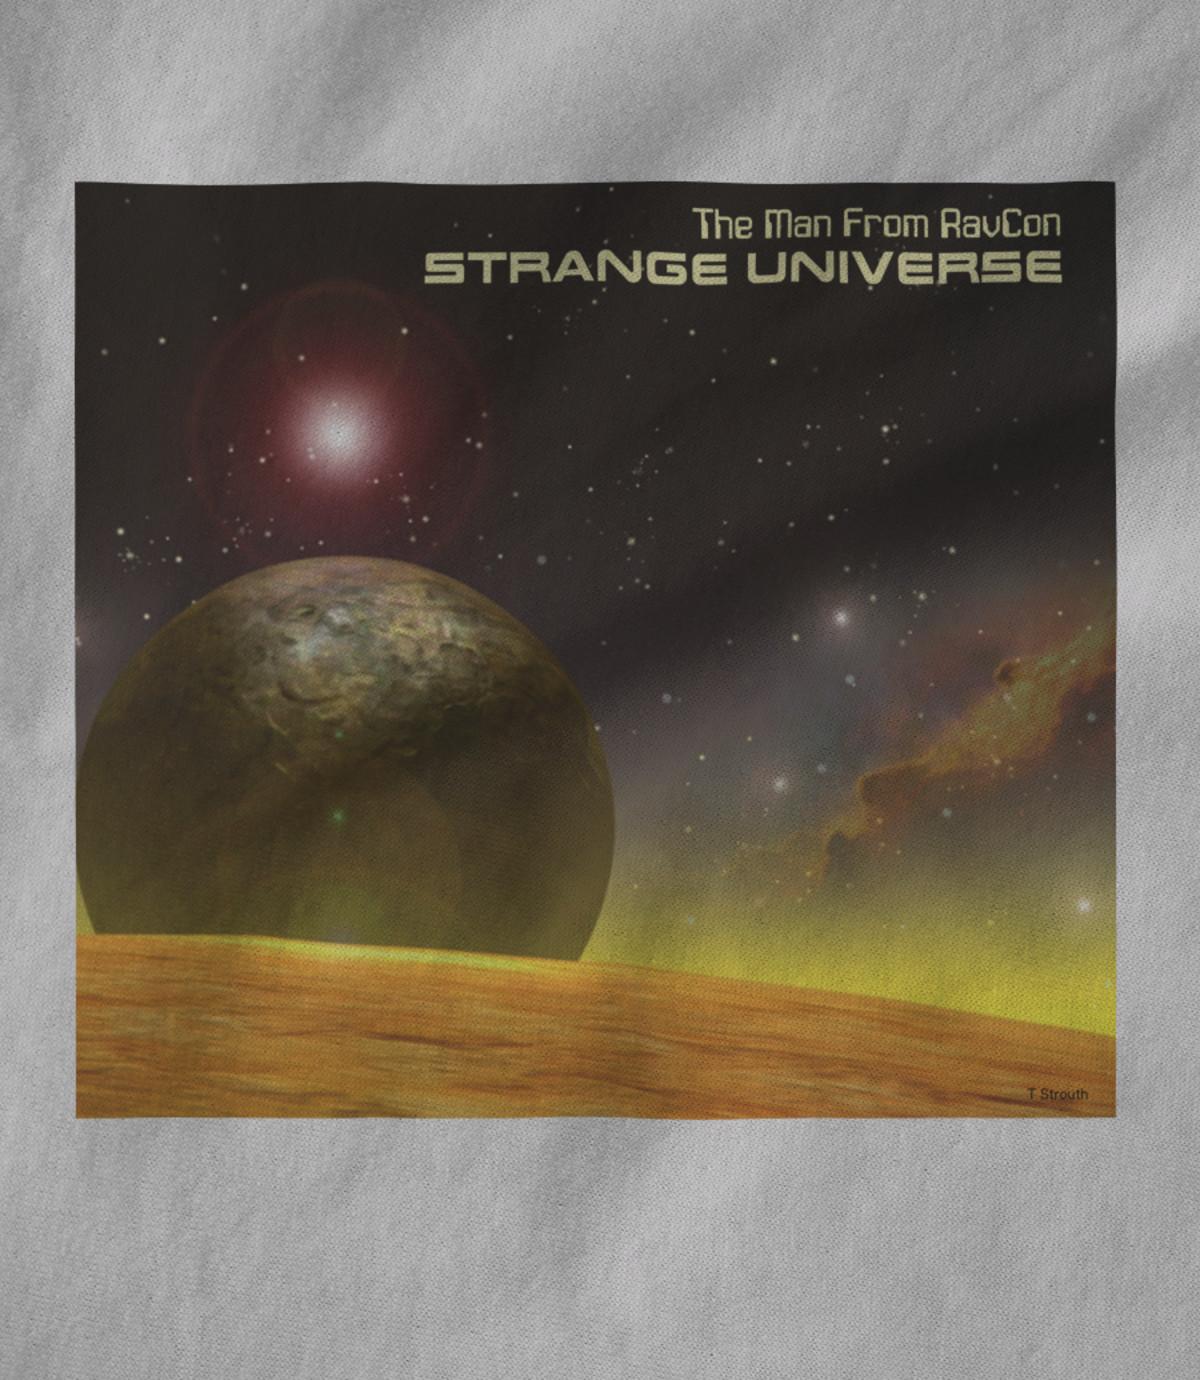 Man from ravcon strange universe 1479919191